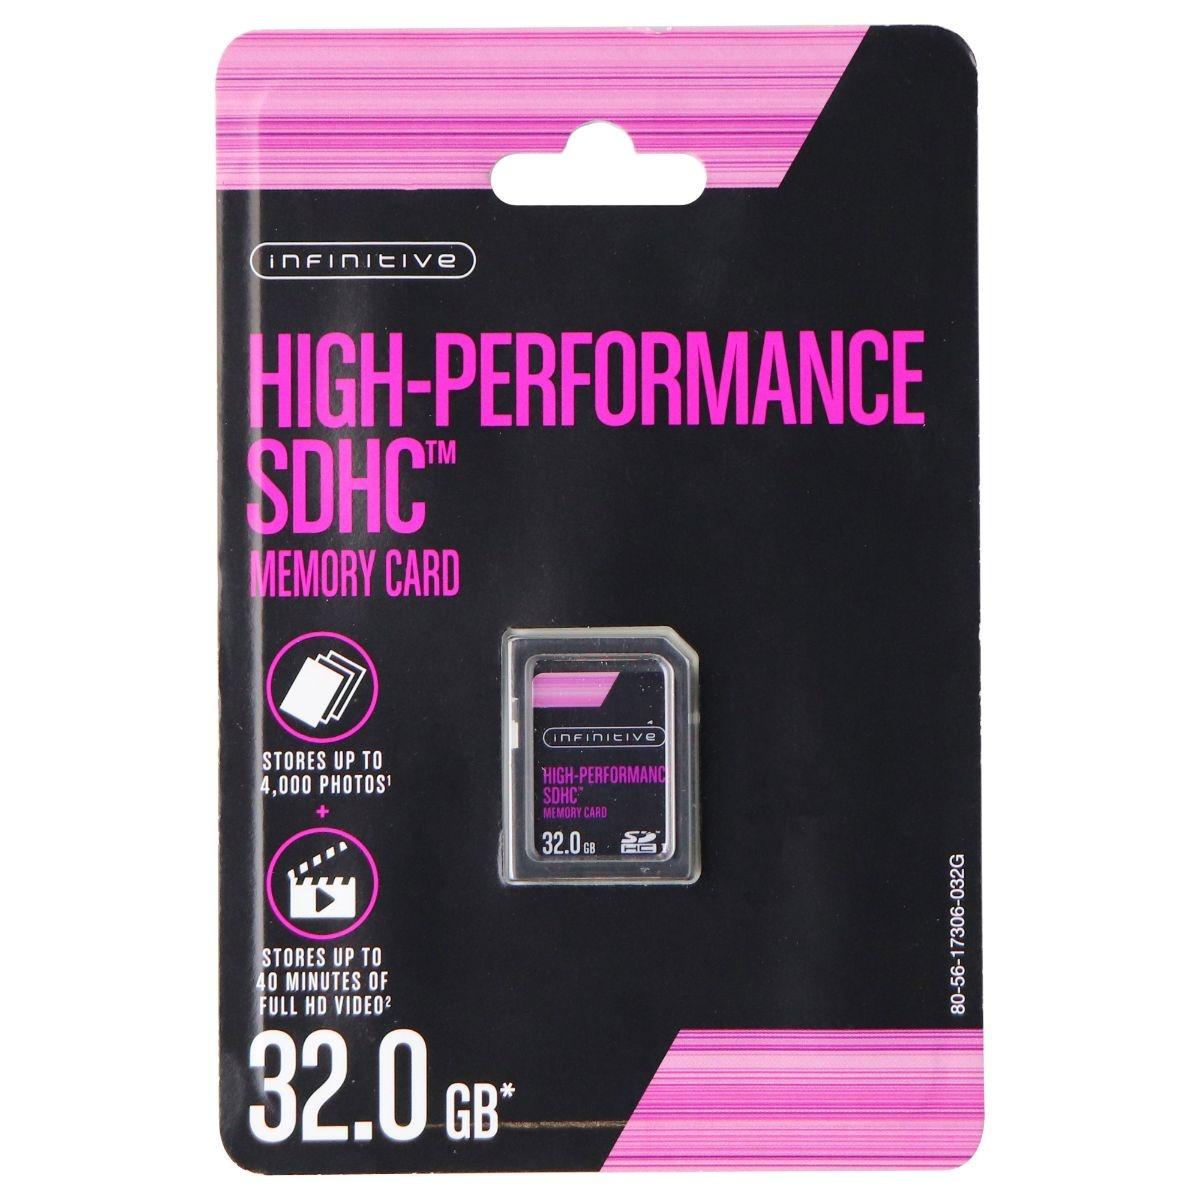 Infinitive High-Performance SDHC Memory Card 32GB (Upto 40Mb/s) - Black